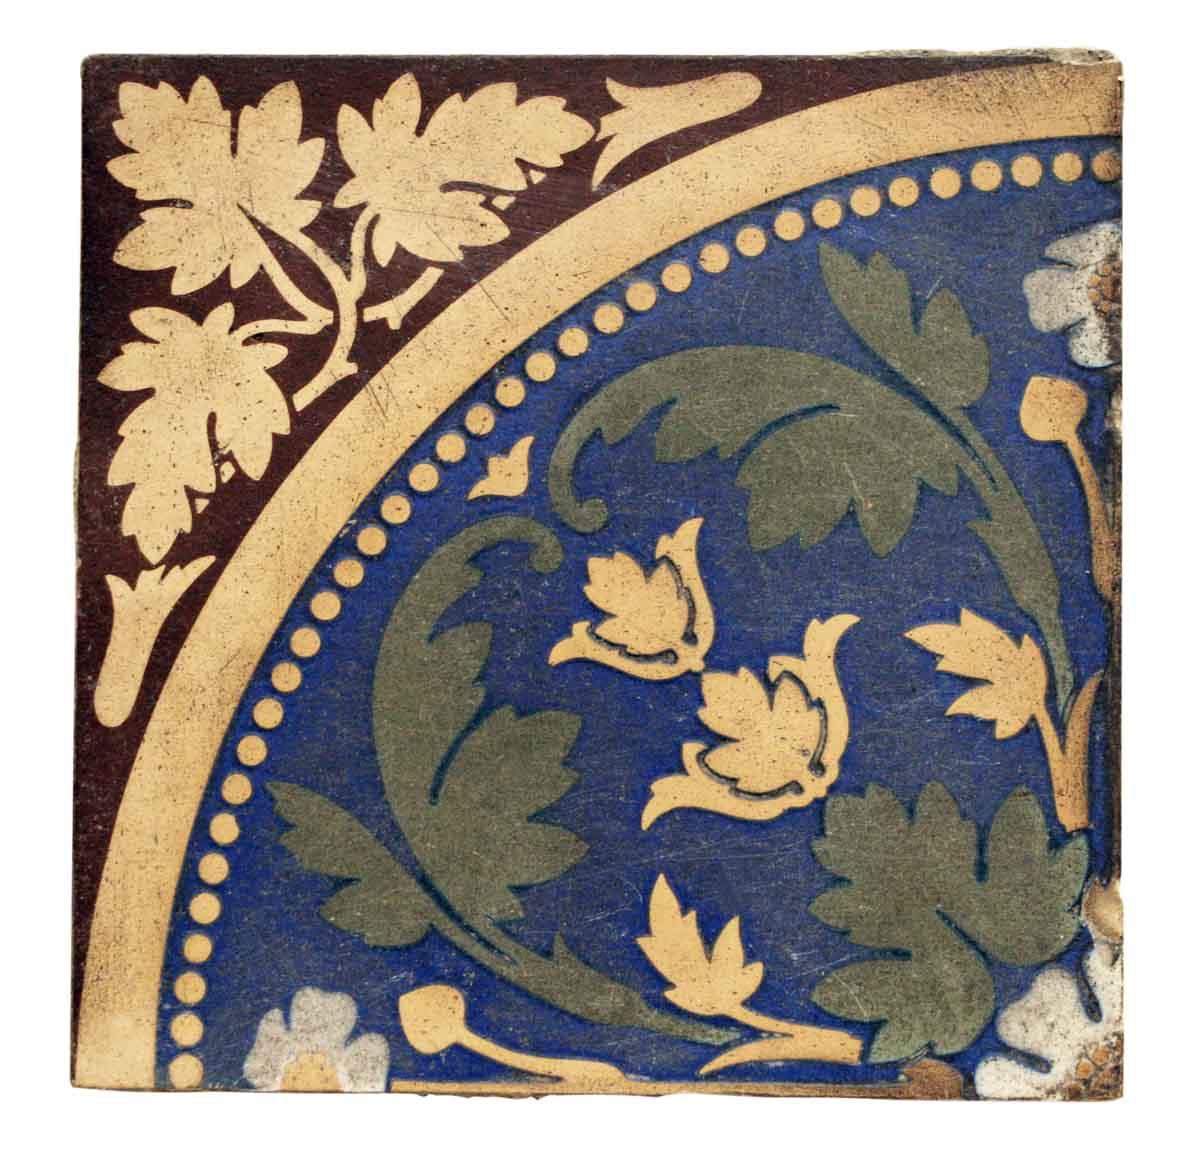 Colorful Leafy Tile